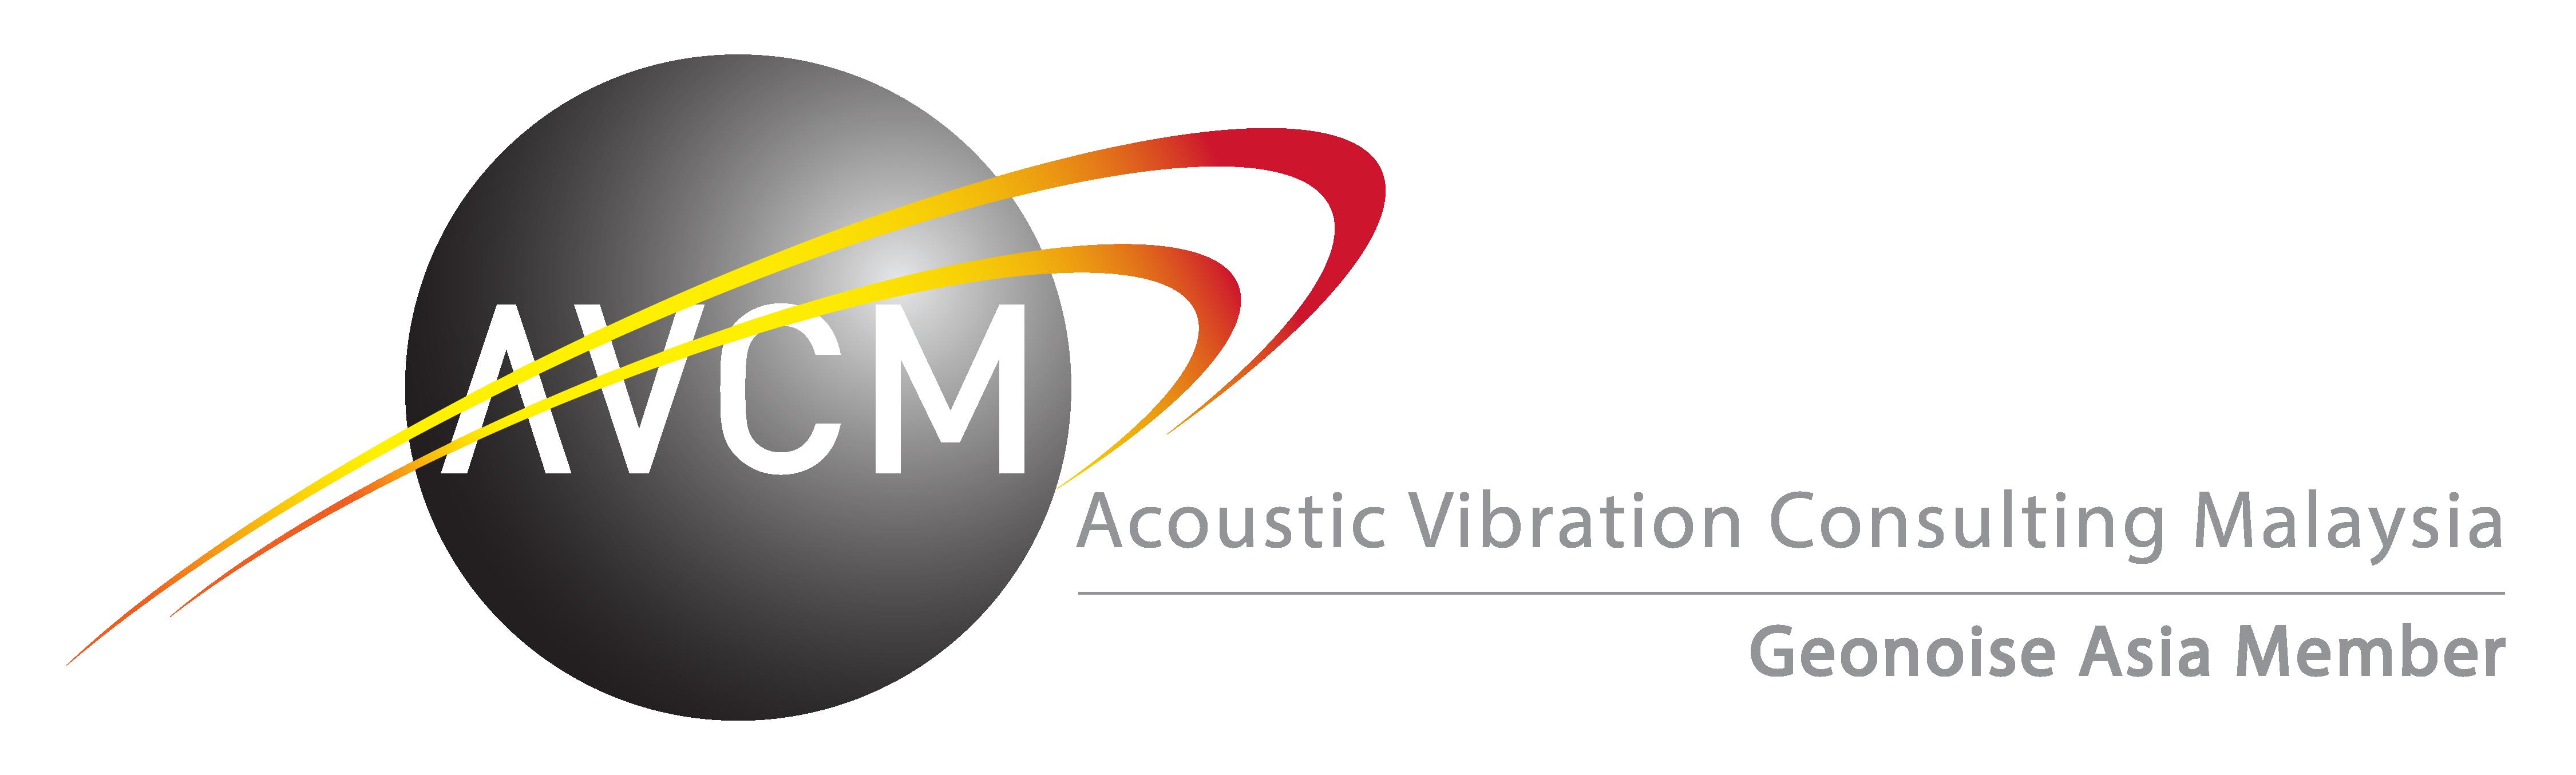 Perundingan akustik dan getaran avcm